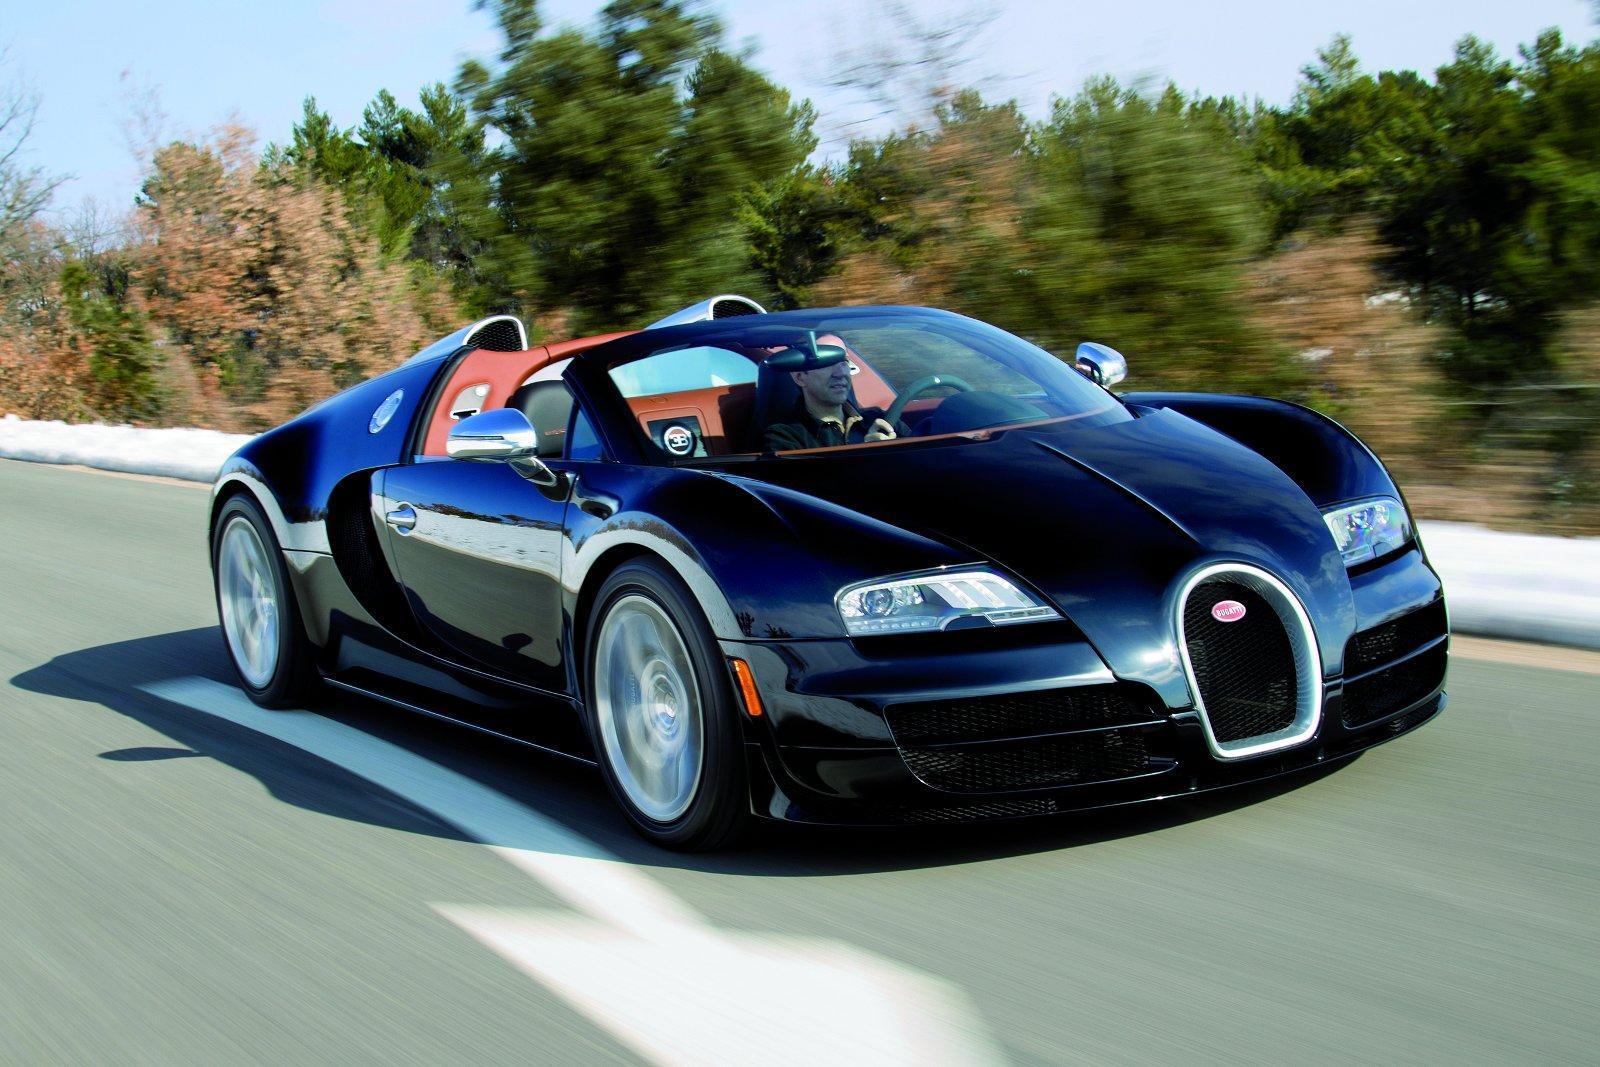 2012 bugatti veyron grand sport vitesse owner manual pdf. Black Bedroom Furniture Sets. Home Design Ideas